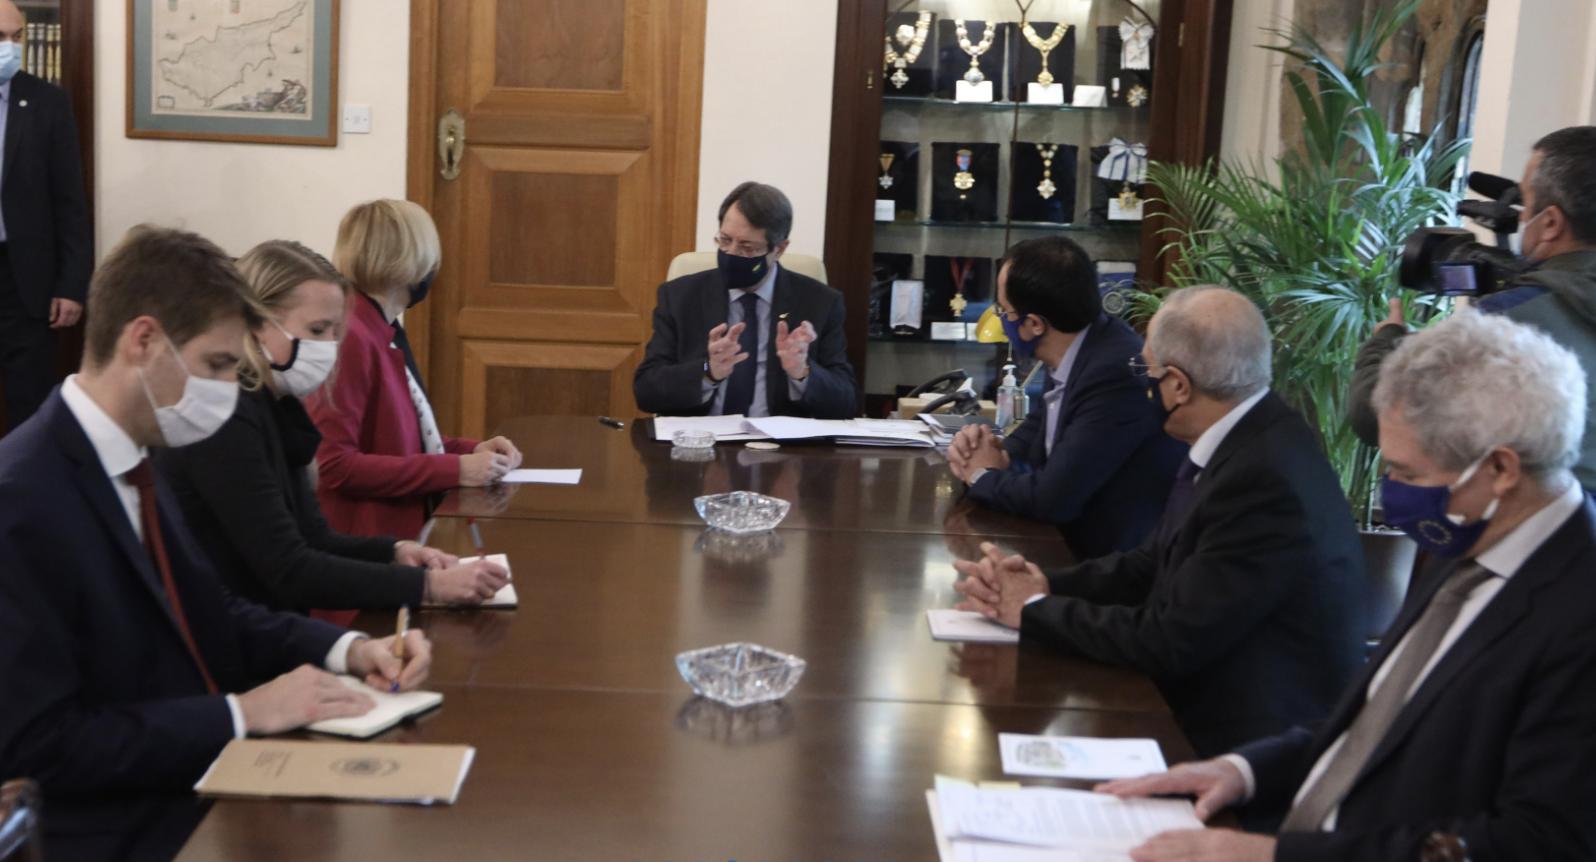 Cyprus: UNFICYP at the focus of the Anastasiades, Spehar meeting